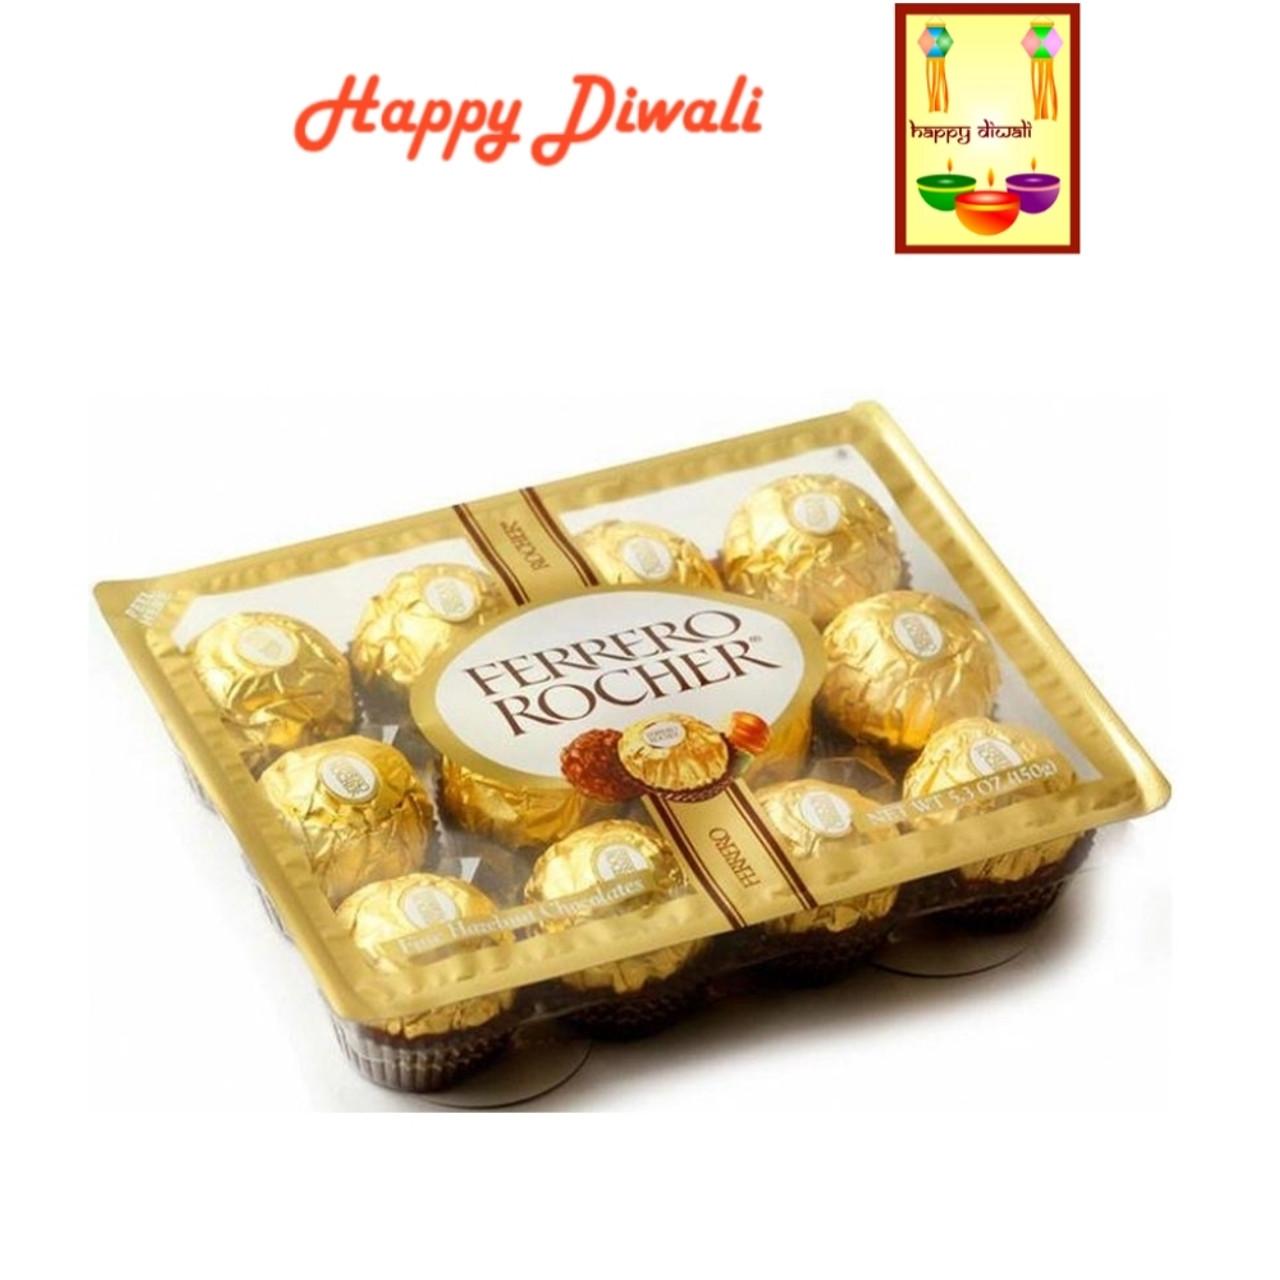 Diwali Chocolates Ferrero Rocher Chocolates With Diwali Greeting Card